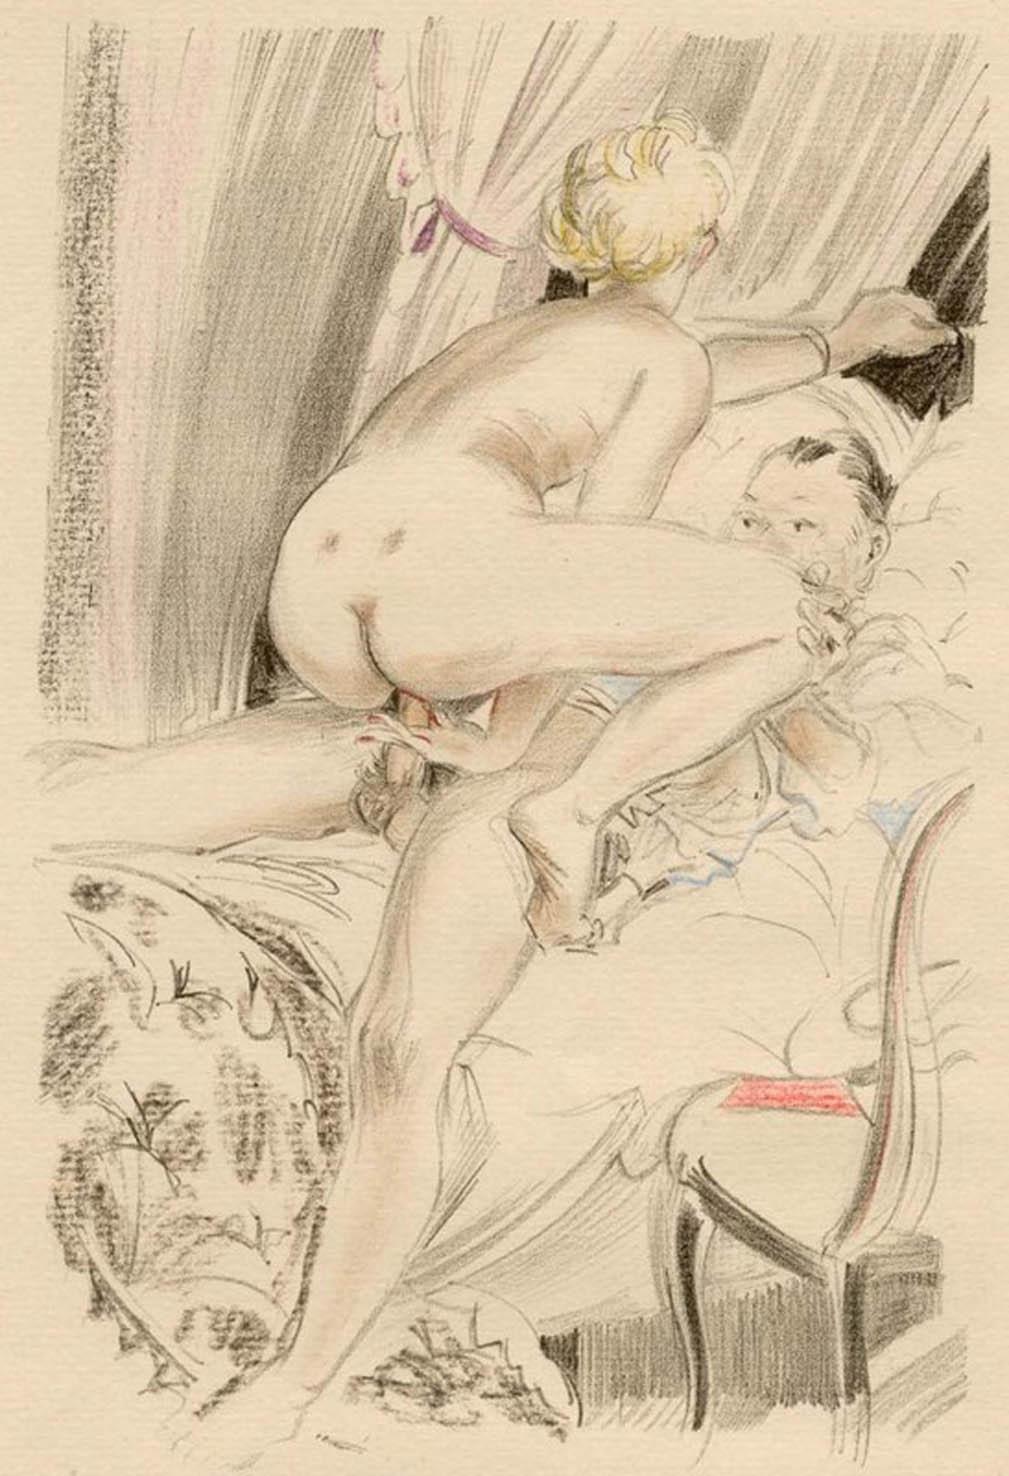 escort ekstra bladet erotica næstved